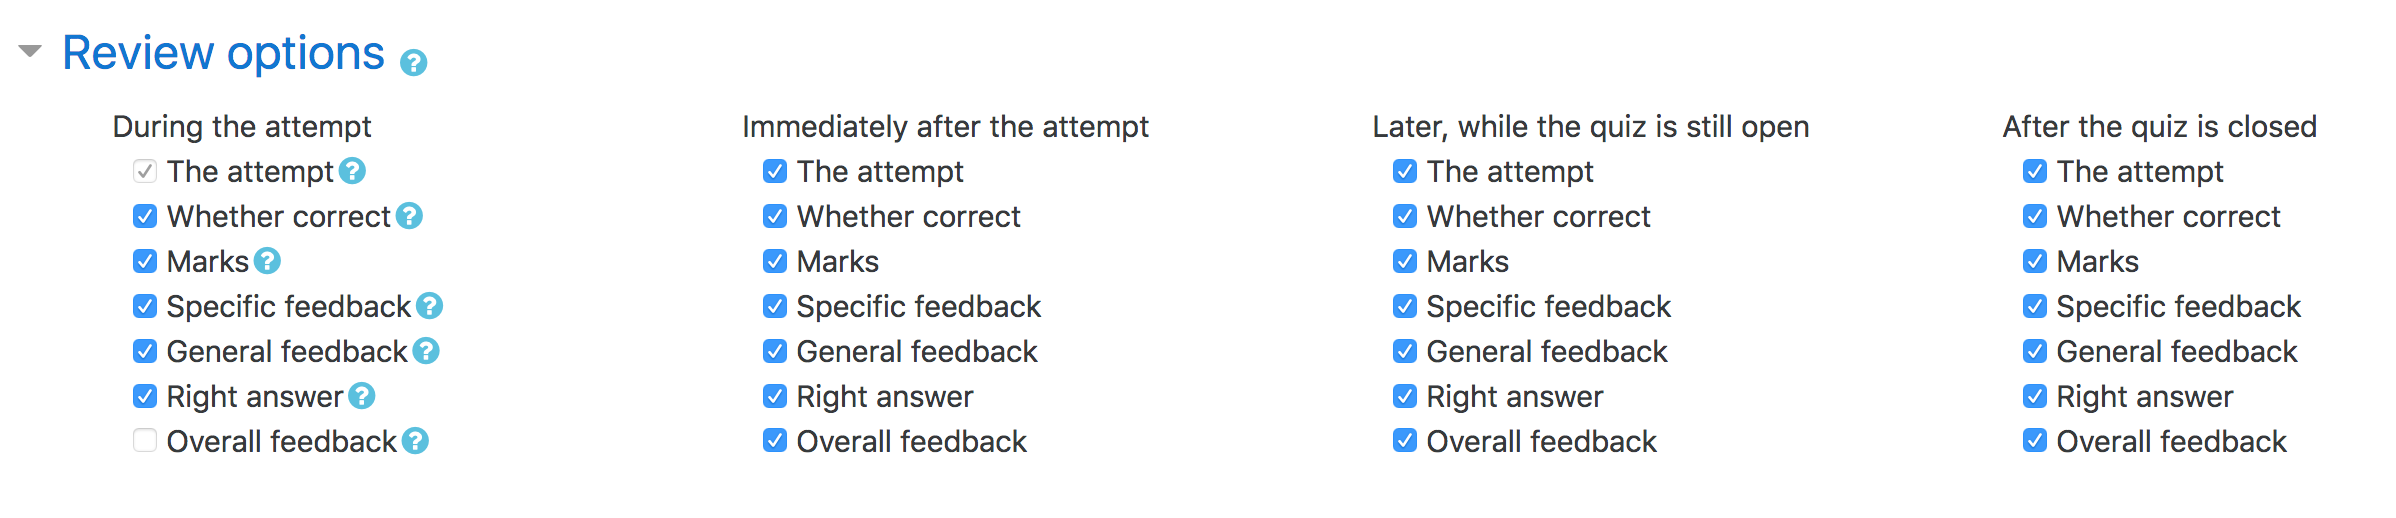 Quiz review options